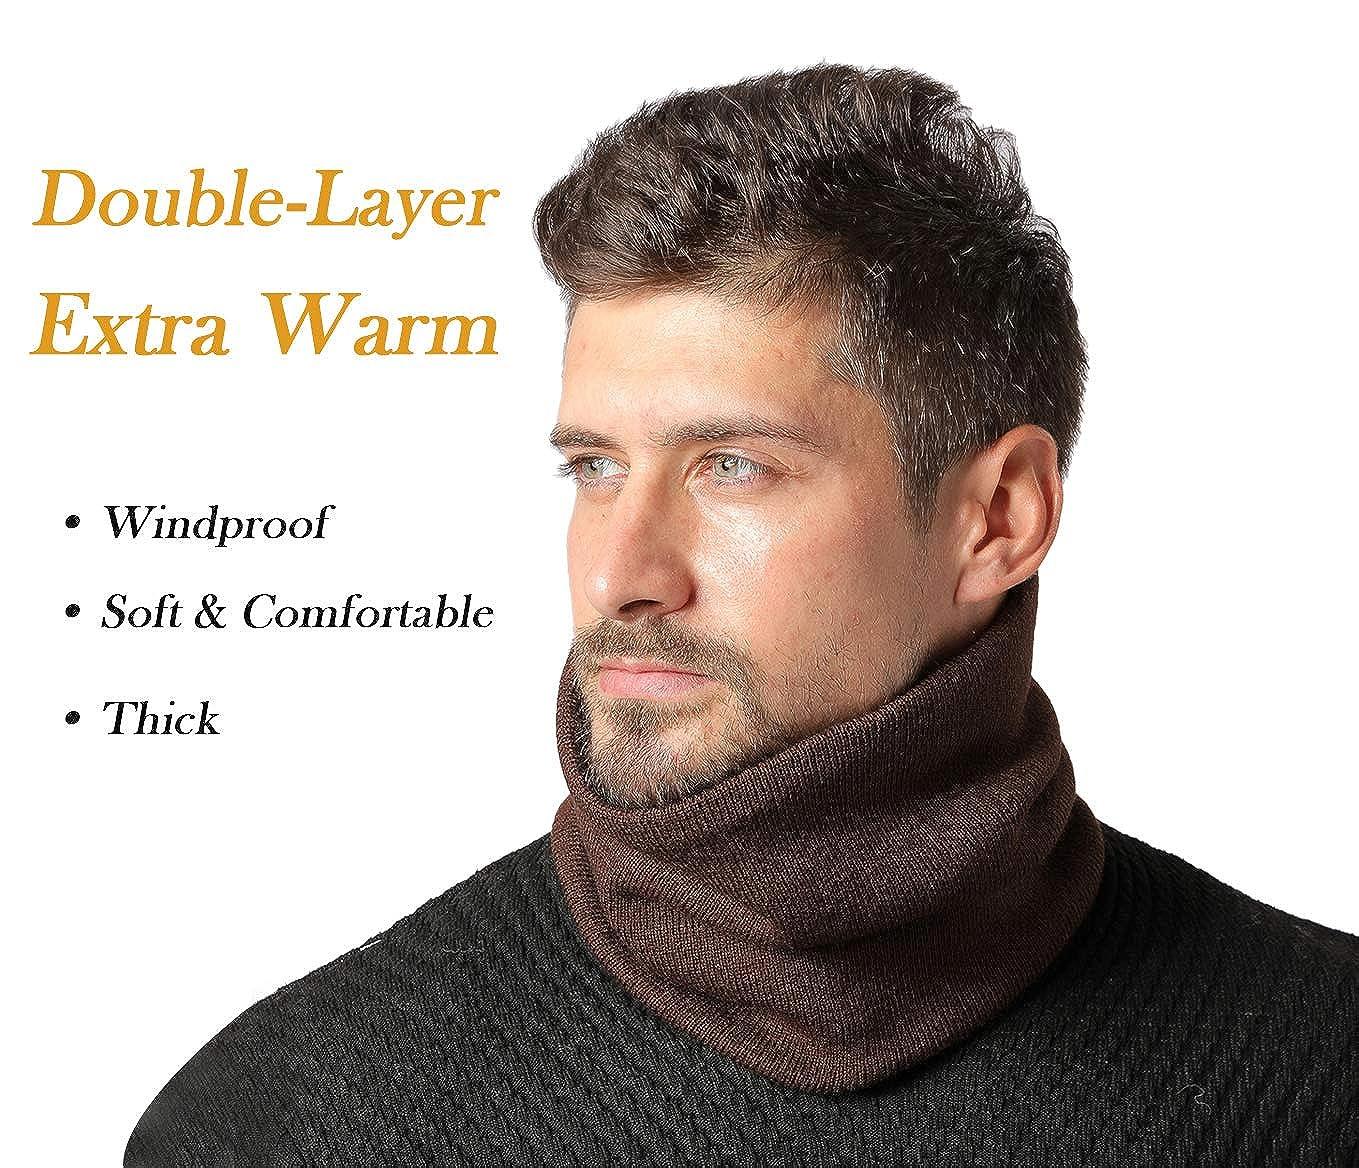 Jormatt 2 Pack//4Pack Double-Layer Thick Neck Warmers Fleece Heat Insulated Thermal Neck Gaiters Winter For Men Women